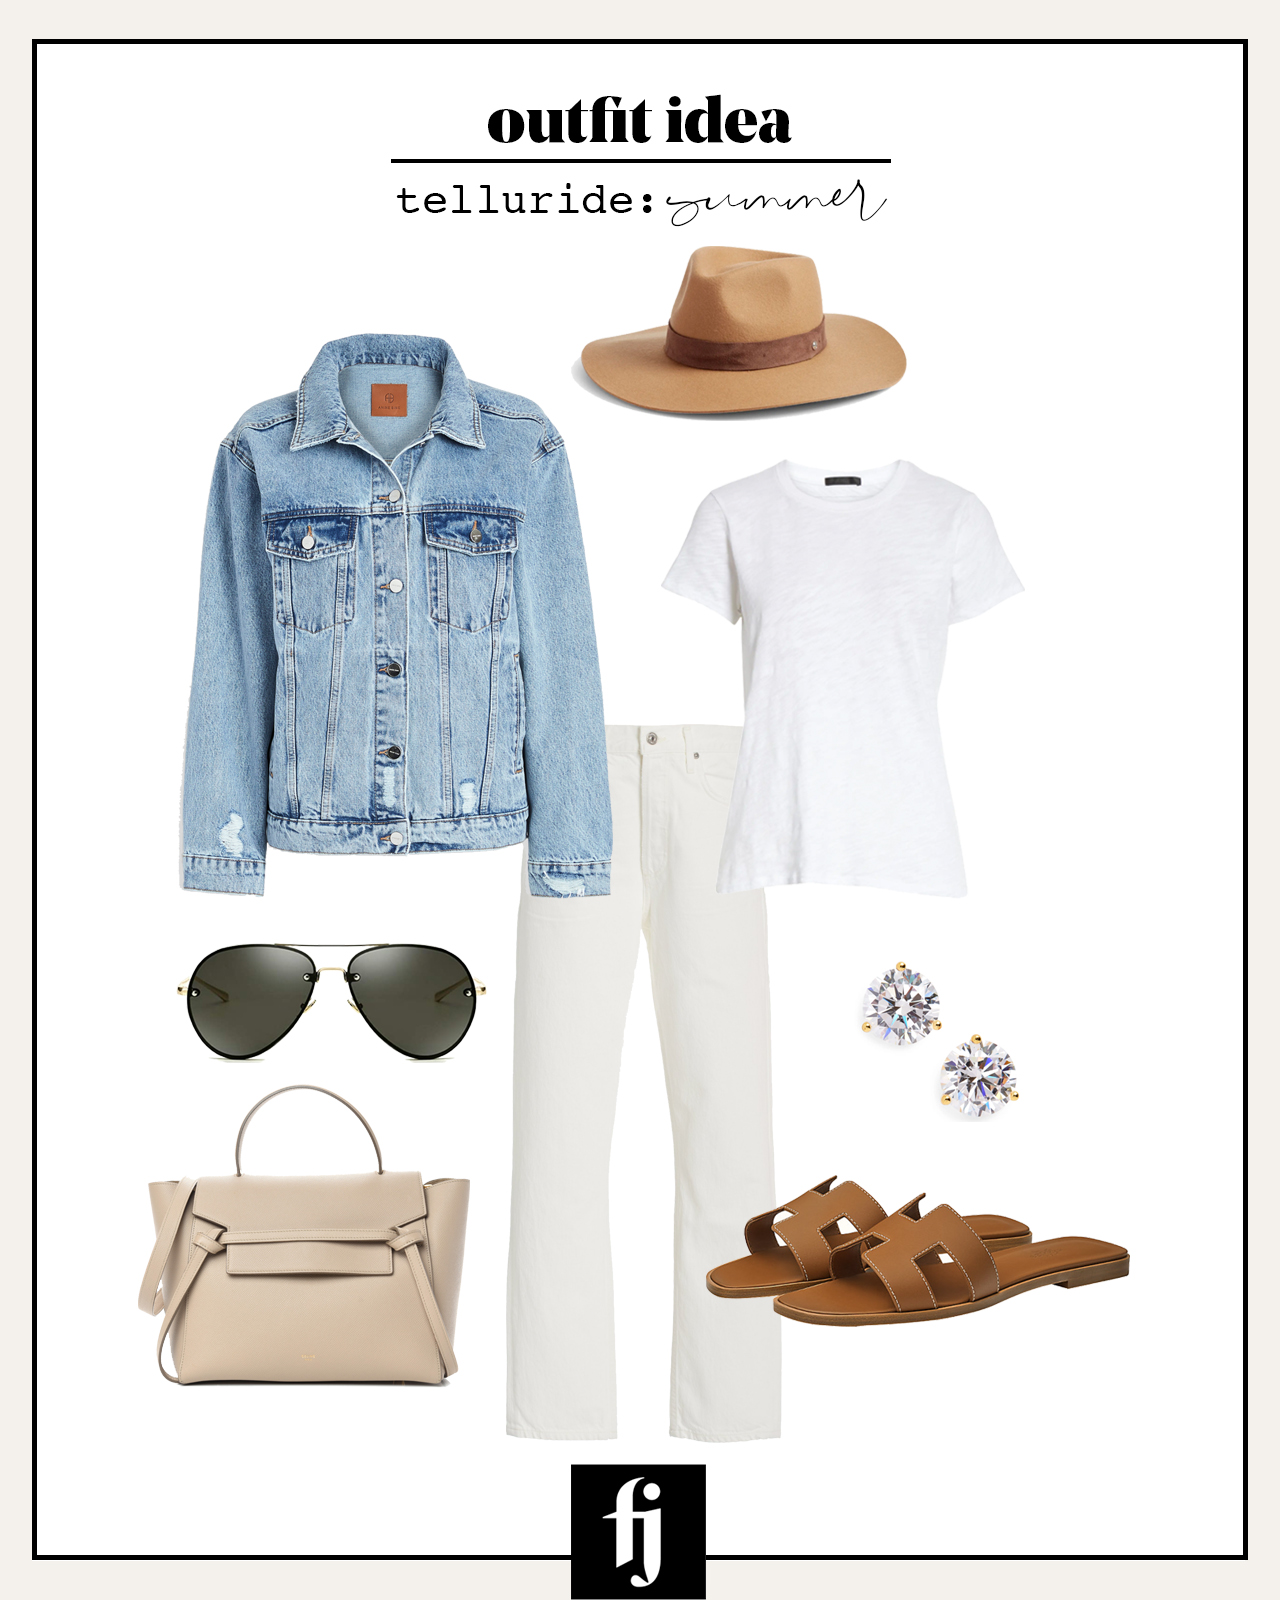 telluride summer outfit idea 2